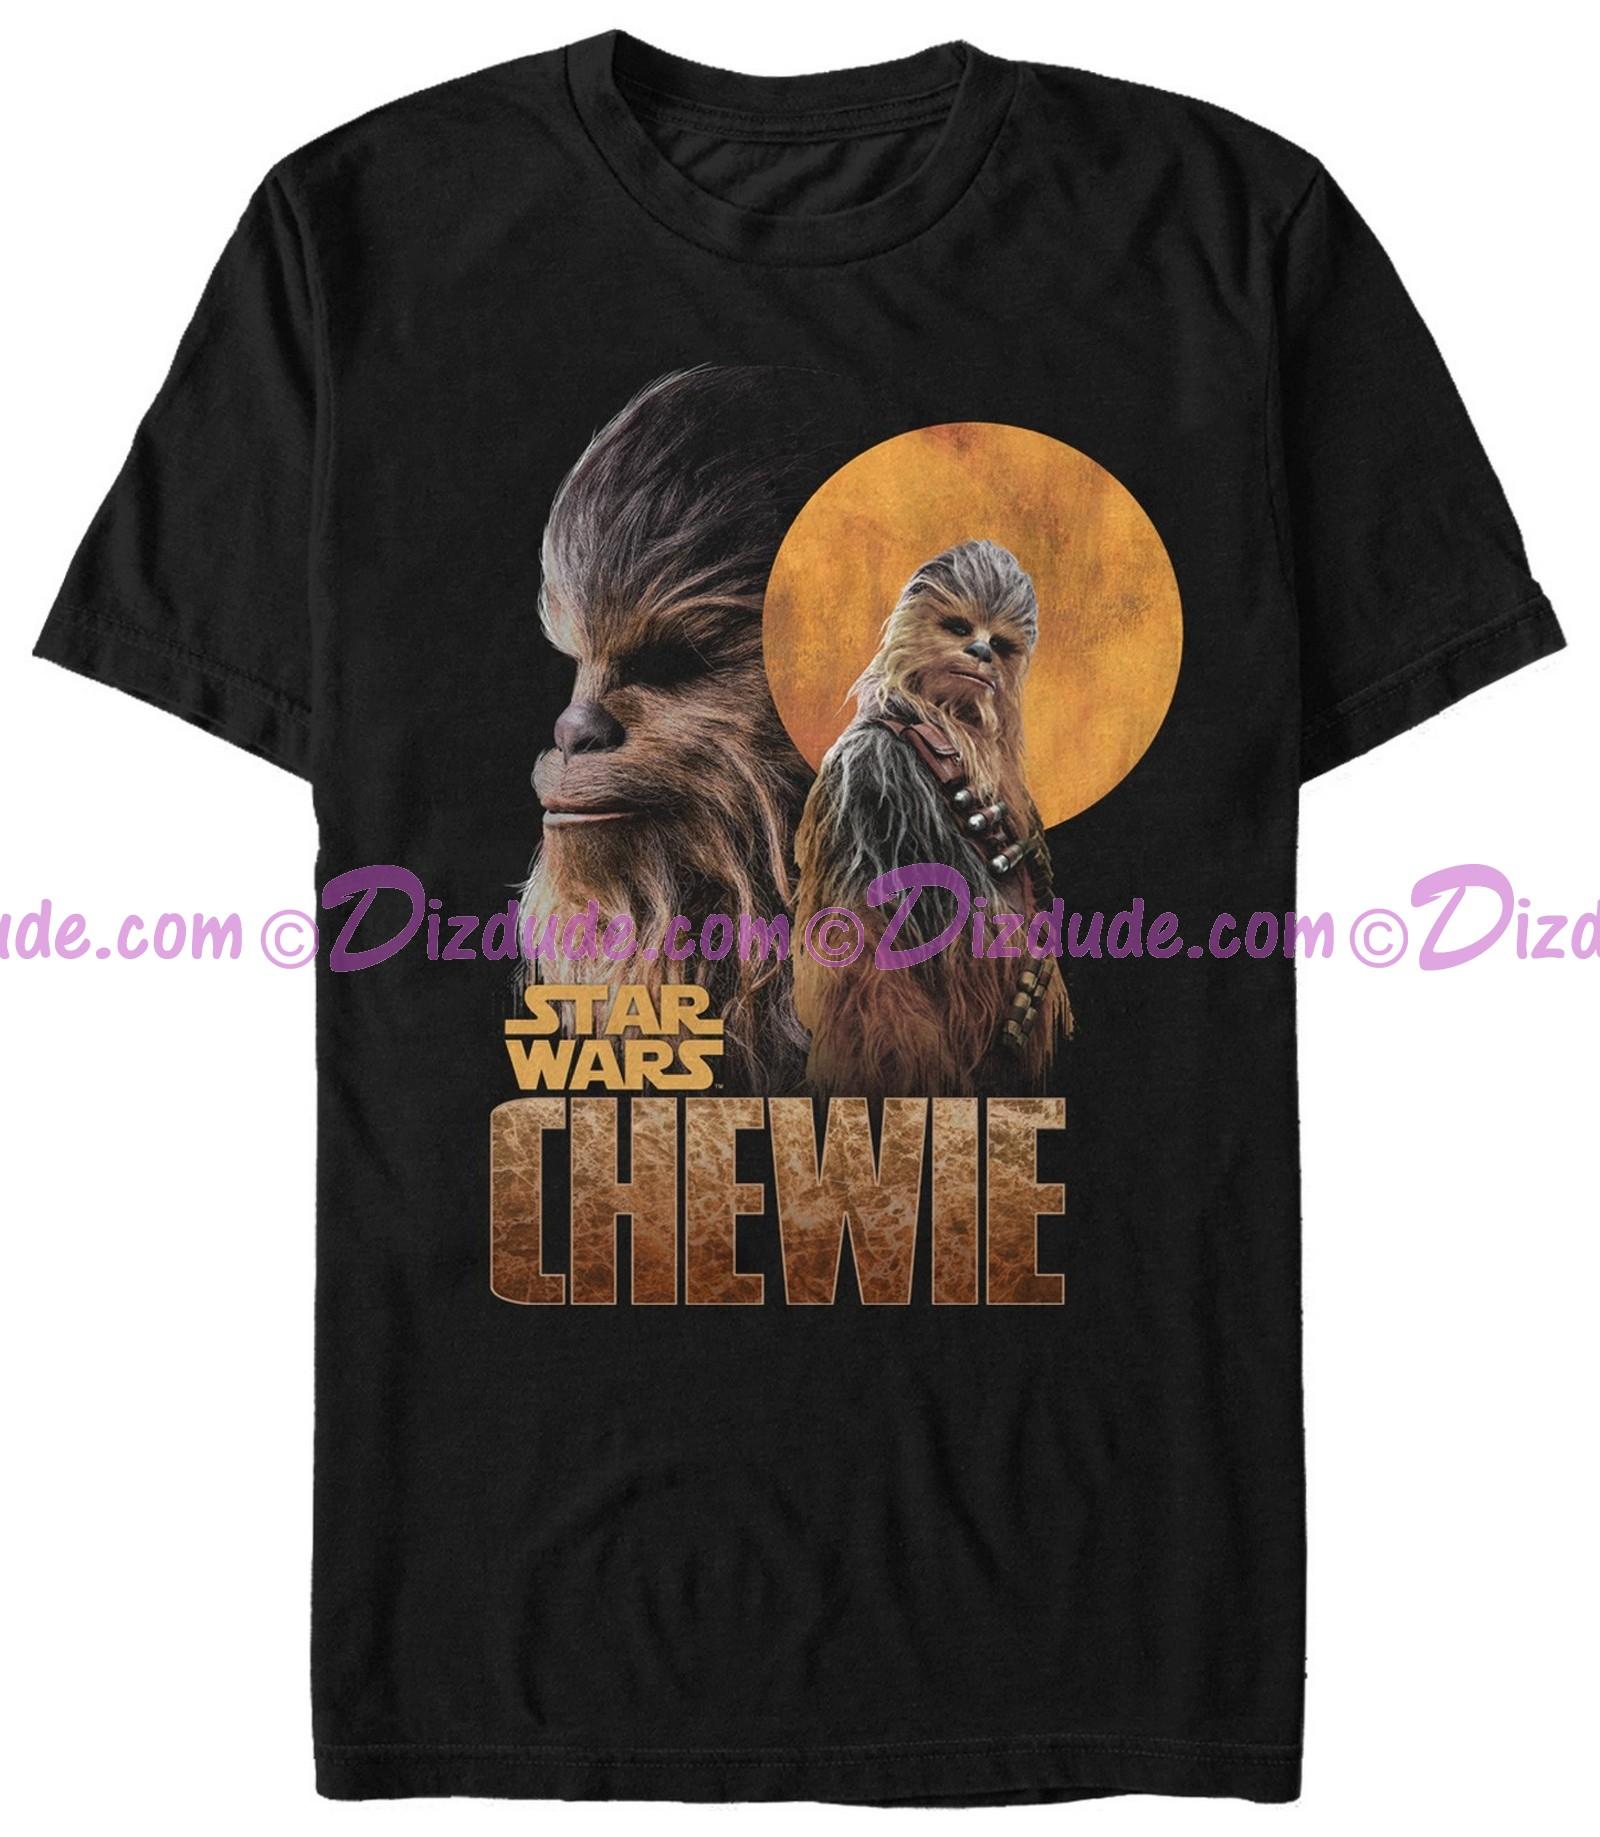 SOLO A Star Wars Story CHEWIE Adult T-Shirt (Tshirt, T shirt or Tee)  © Dizdude.com